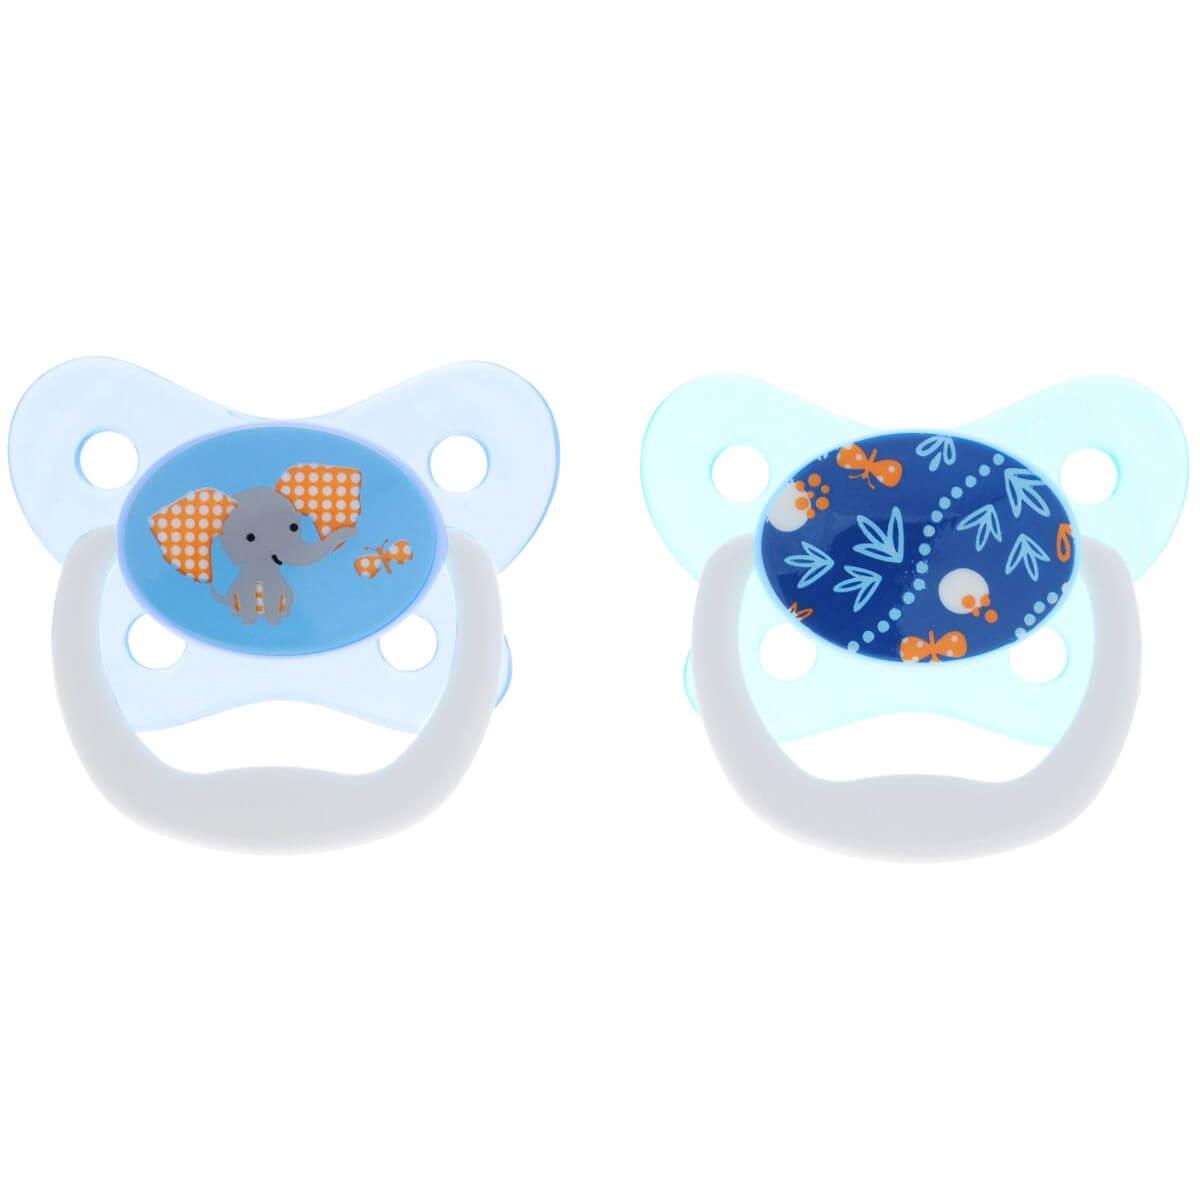 Dr Browns Prevent Πιπίλα Πεταλούδα Ορθοδοντική Μπλε Σιλικόνης 6-12m, 22402